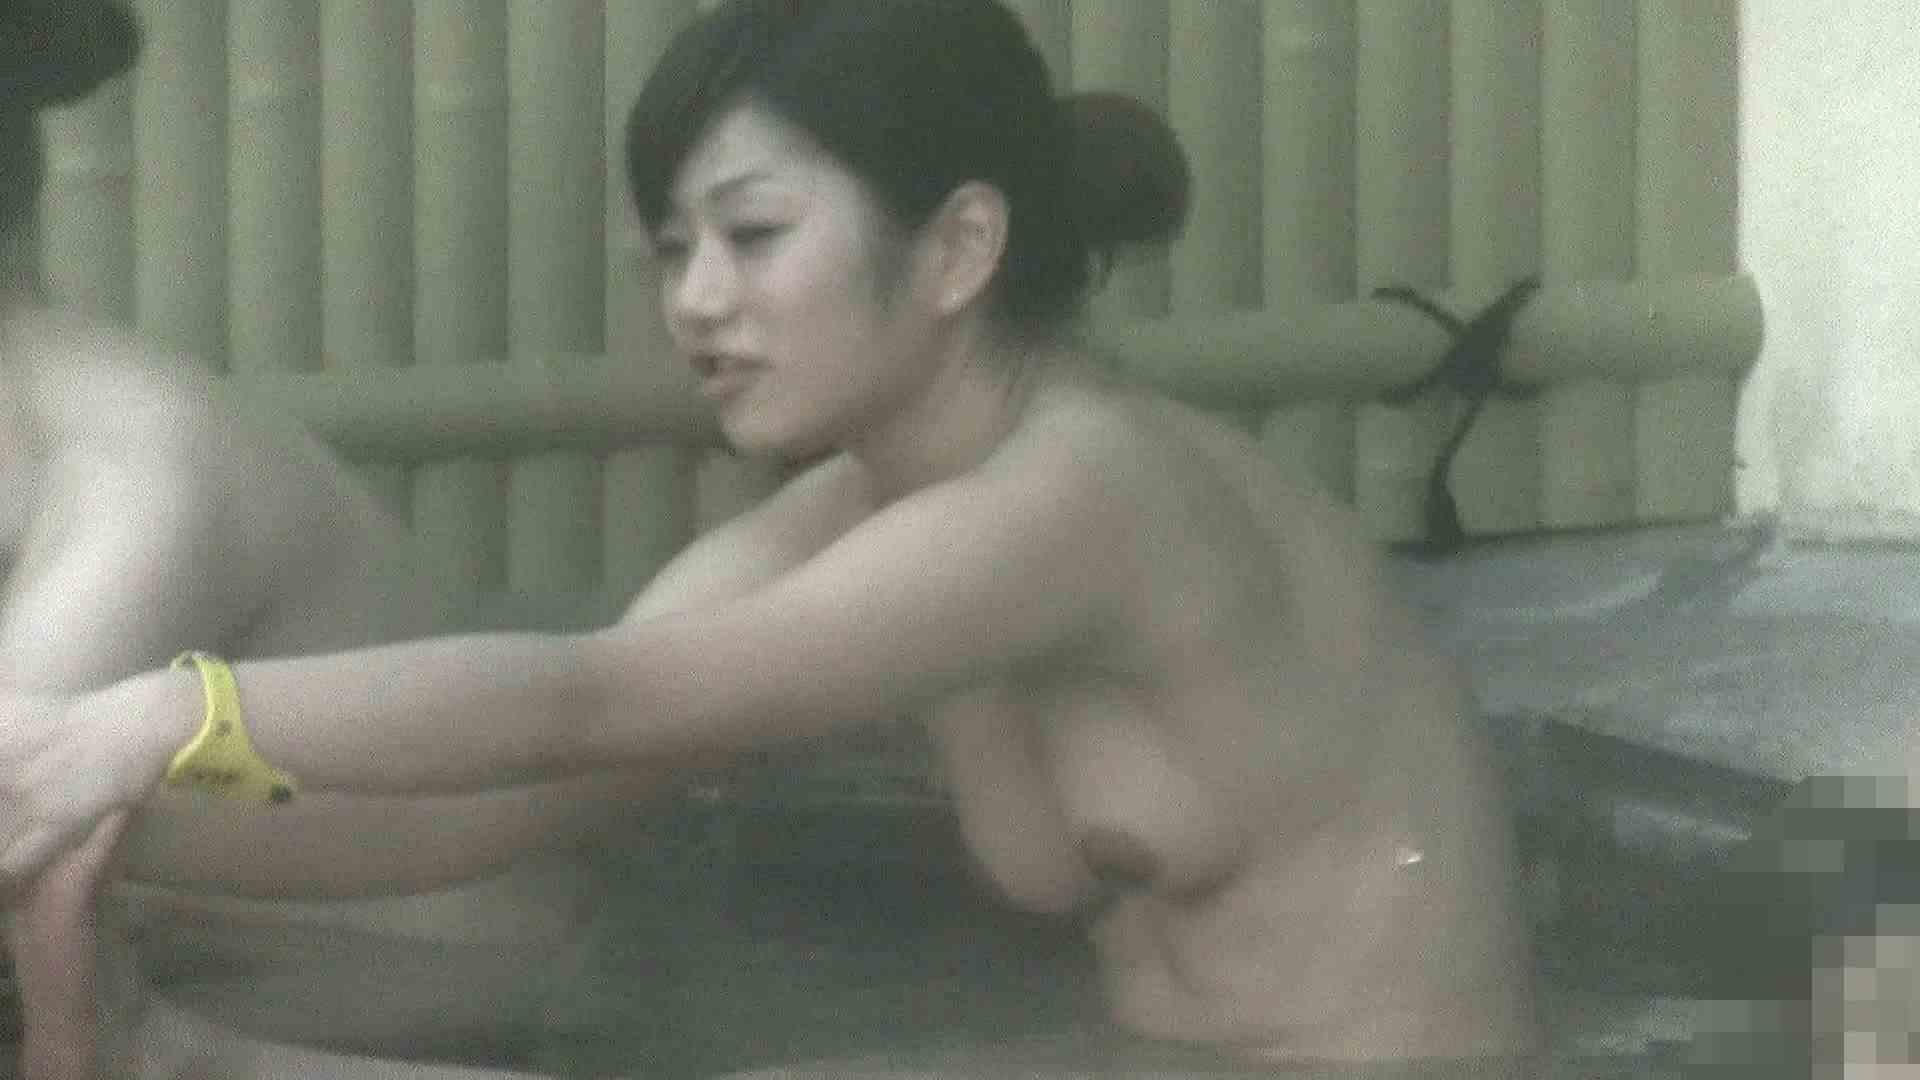 Aquaな露天風呂Vol.206 露天 | HなOL  74pic 16